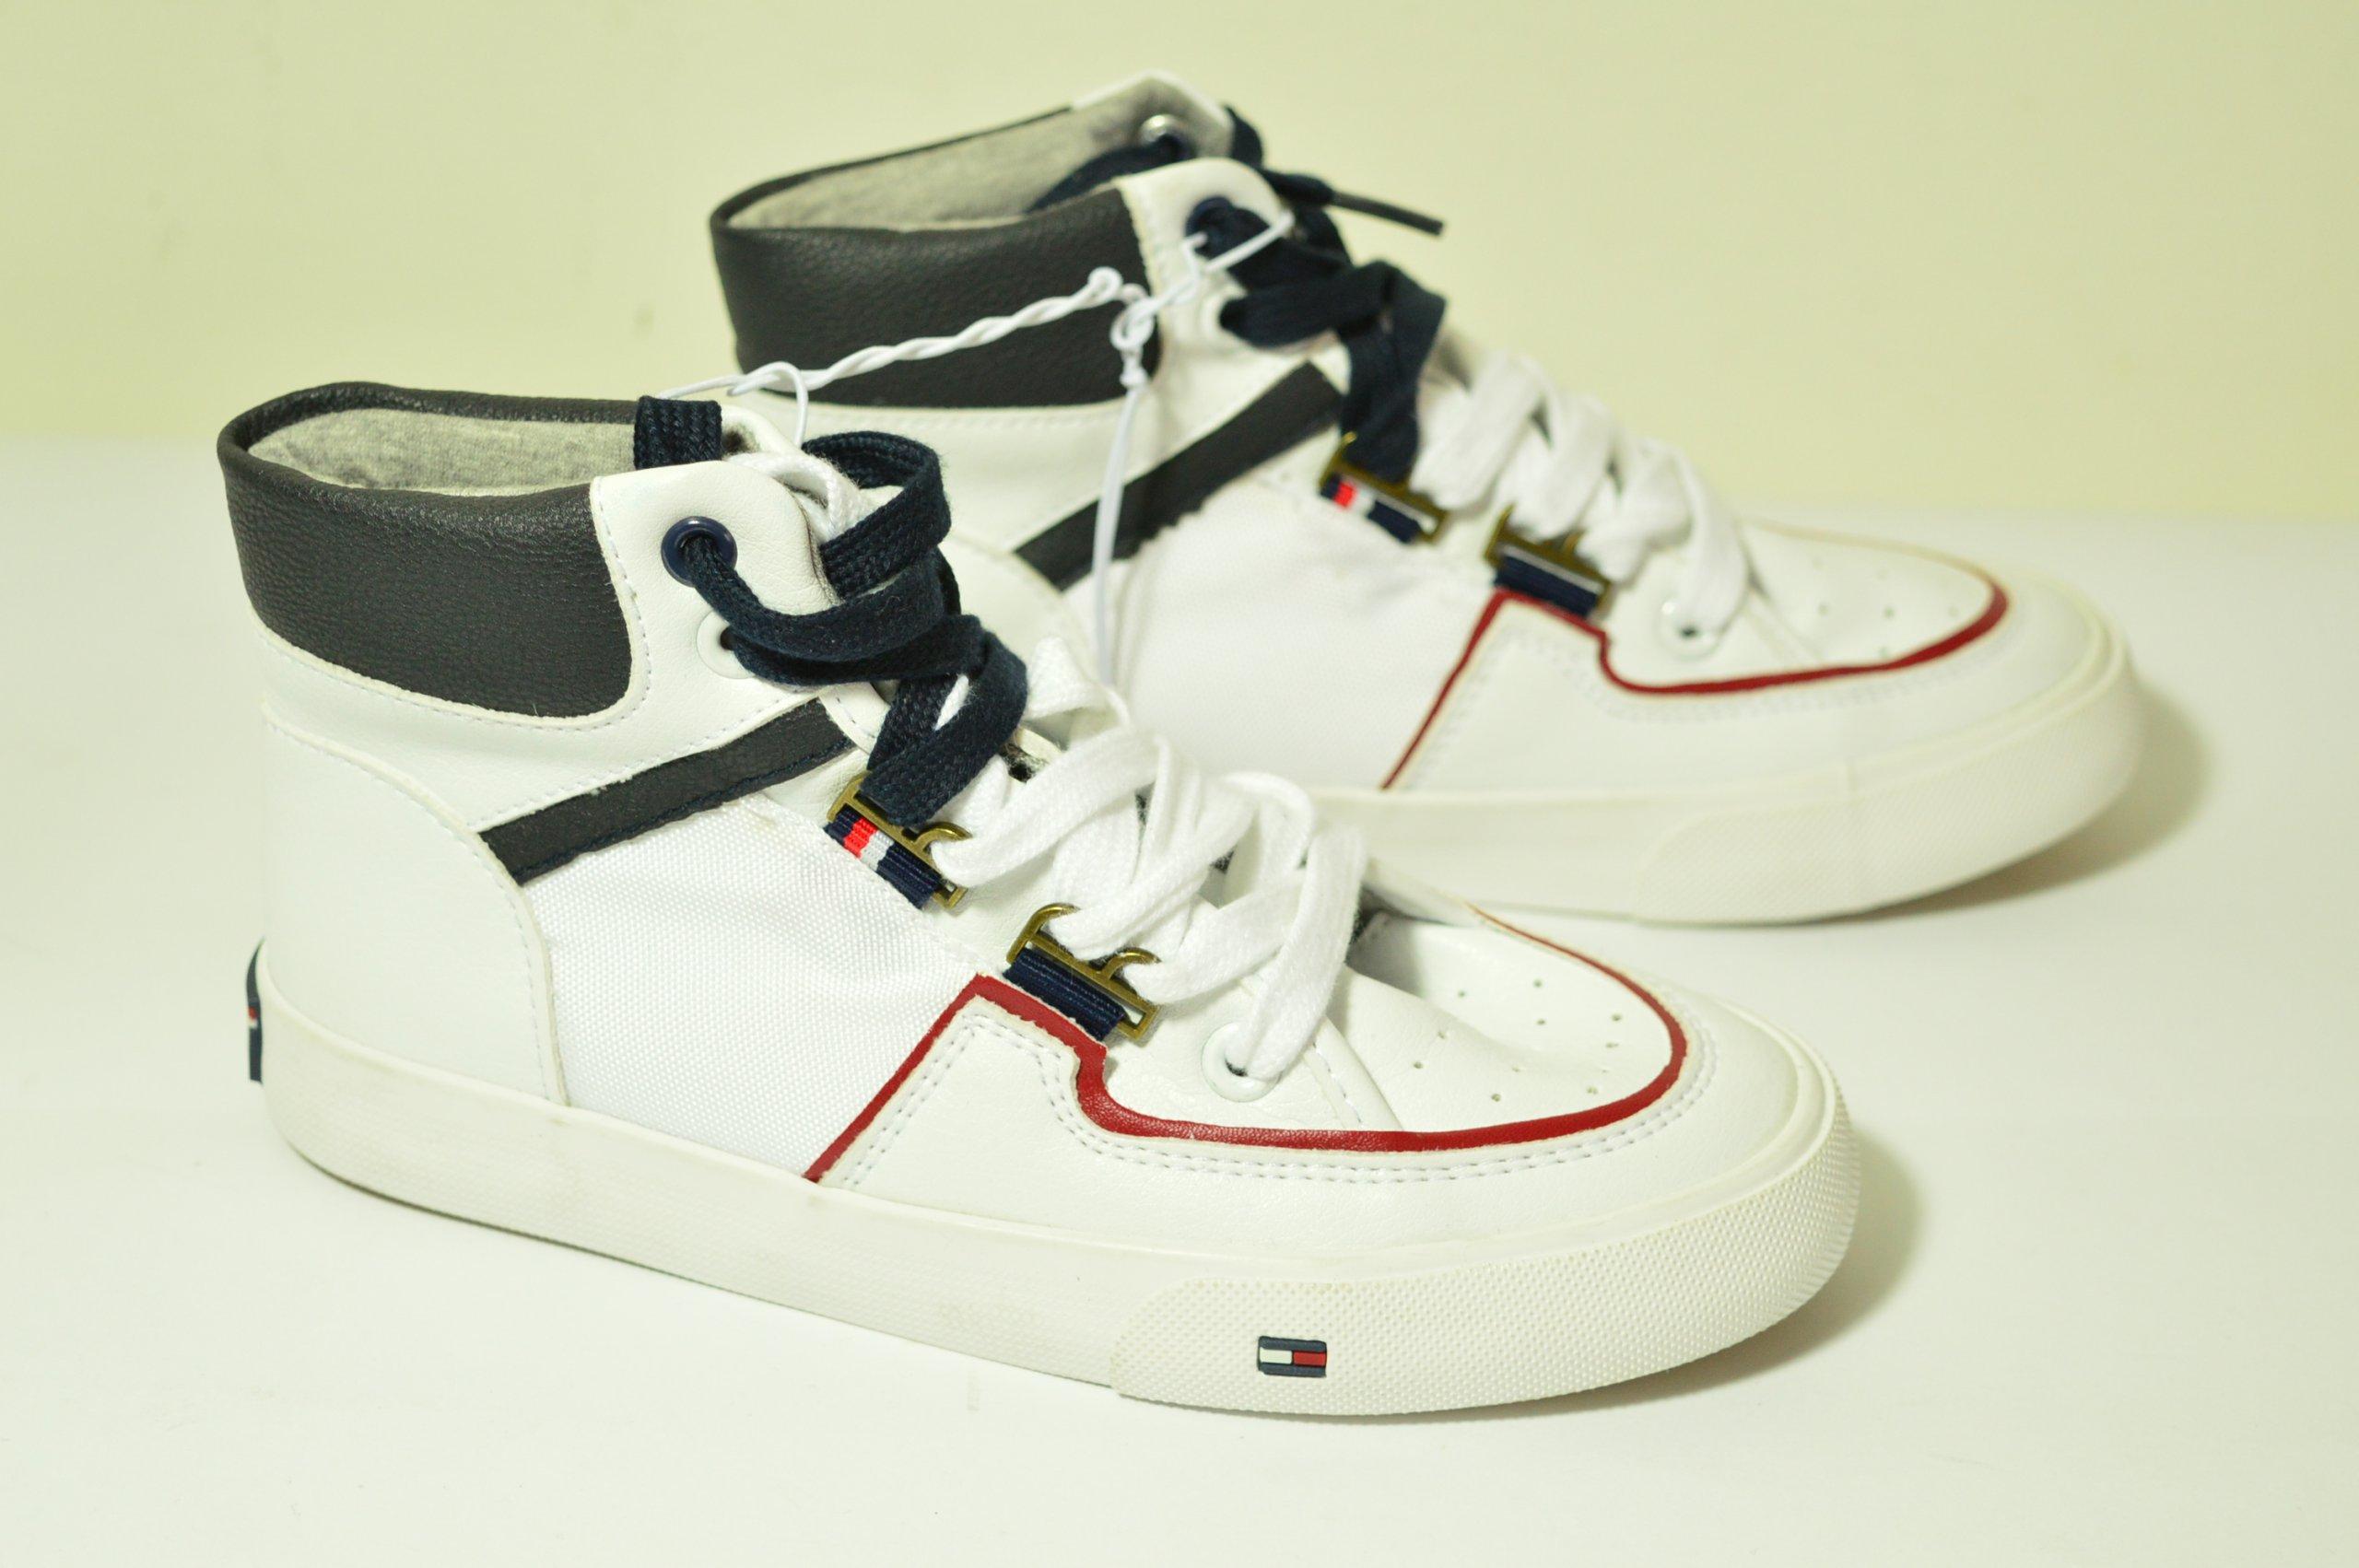 8e0cbb3c99302 Tommy Hilfiger-buty dziecięce r 31 7134294395 - Allegro.pl